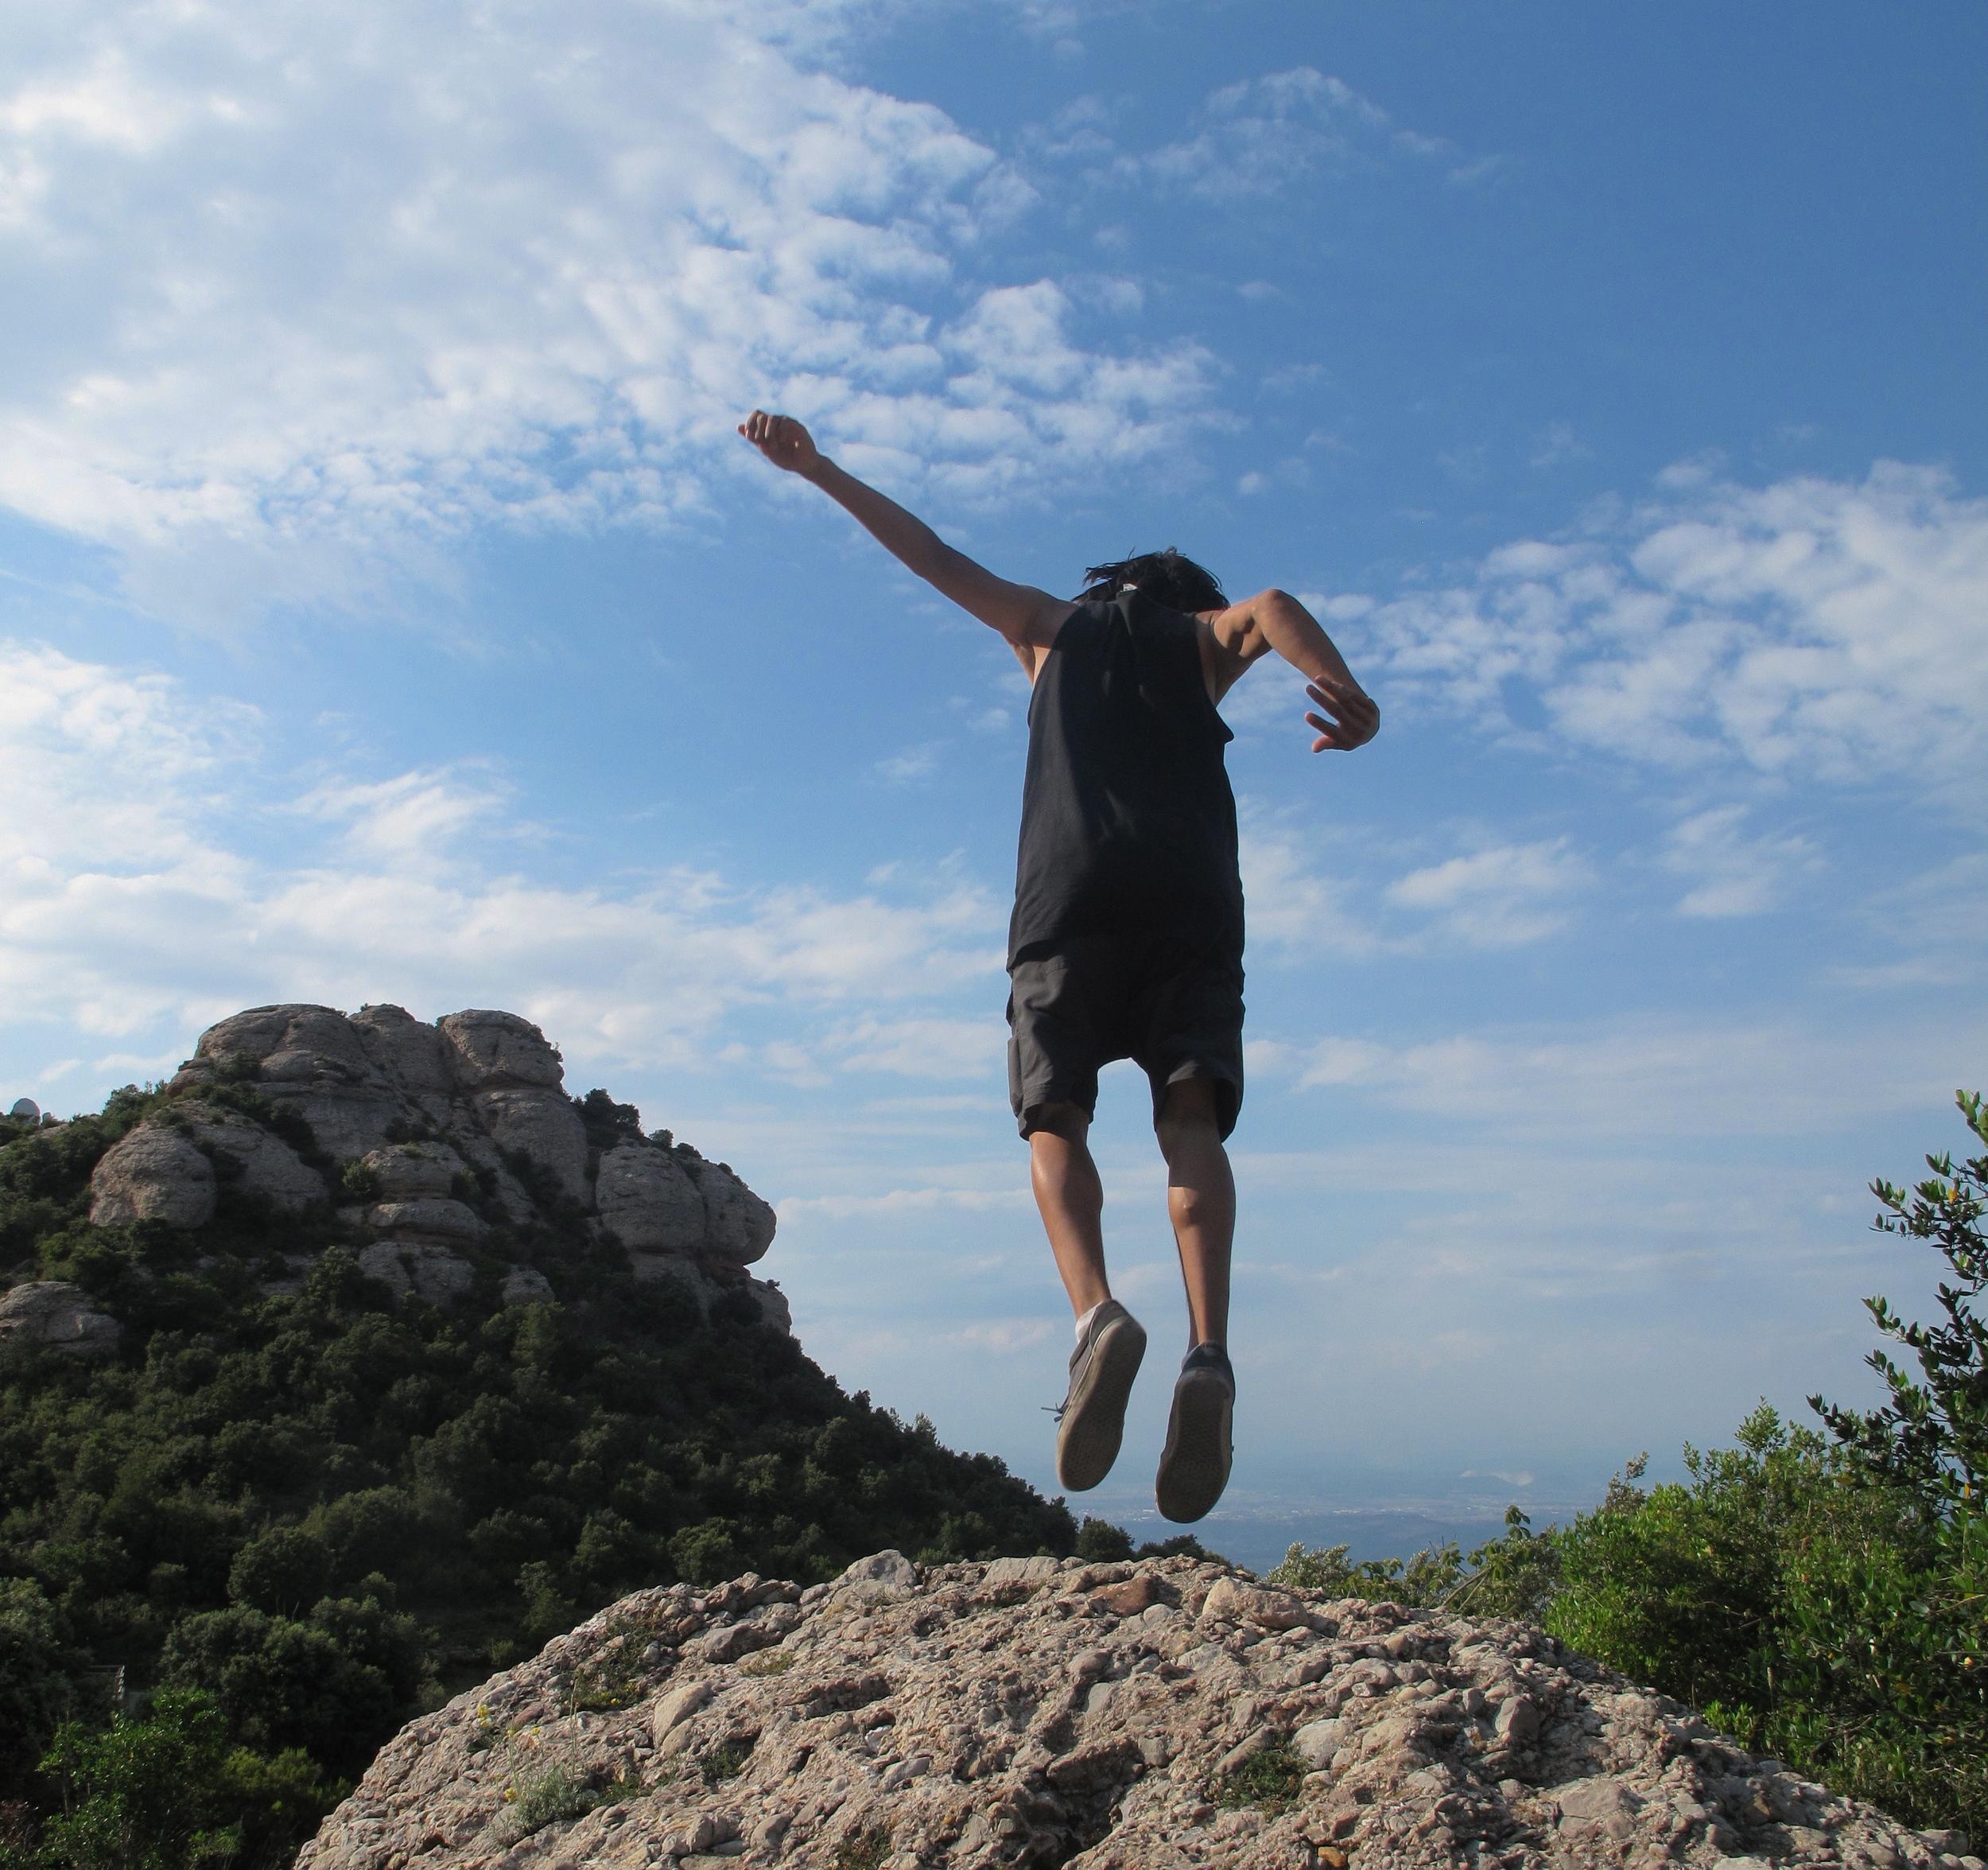 Let's be adventurers - climbing Montserrat